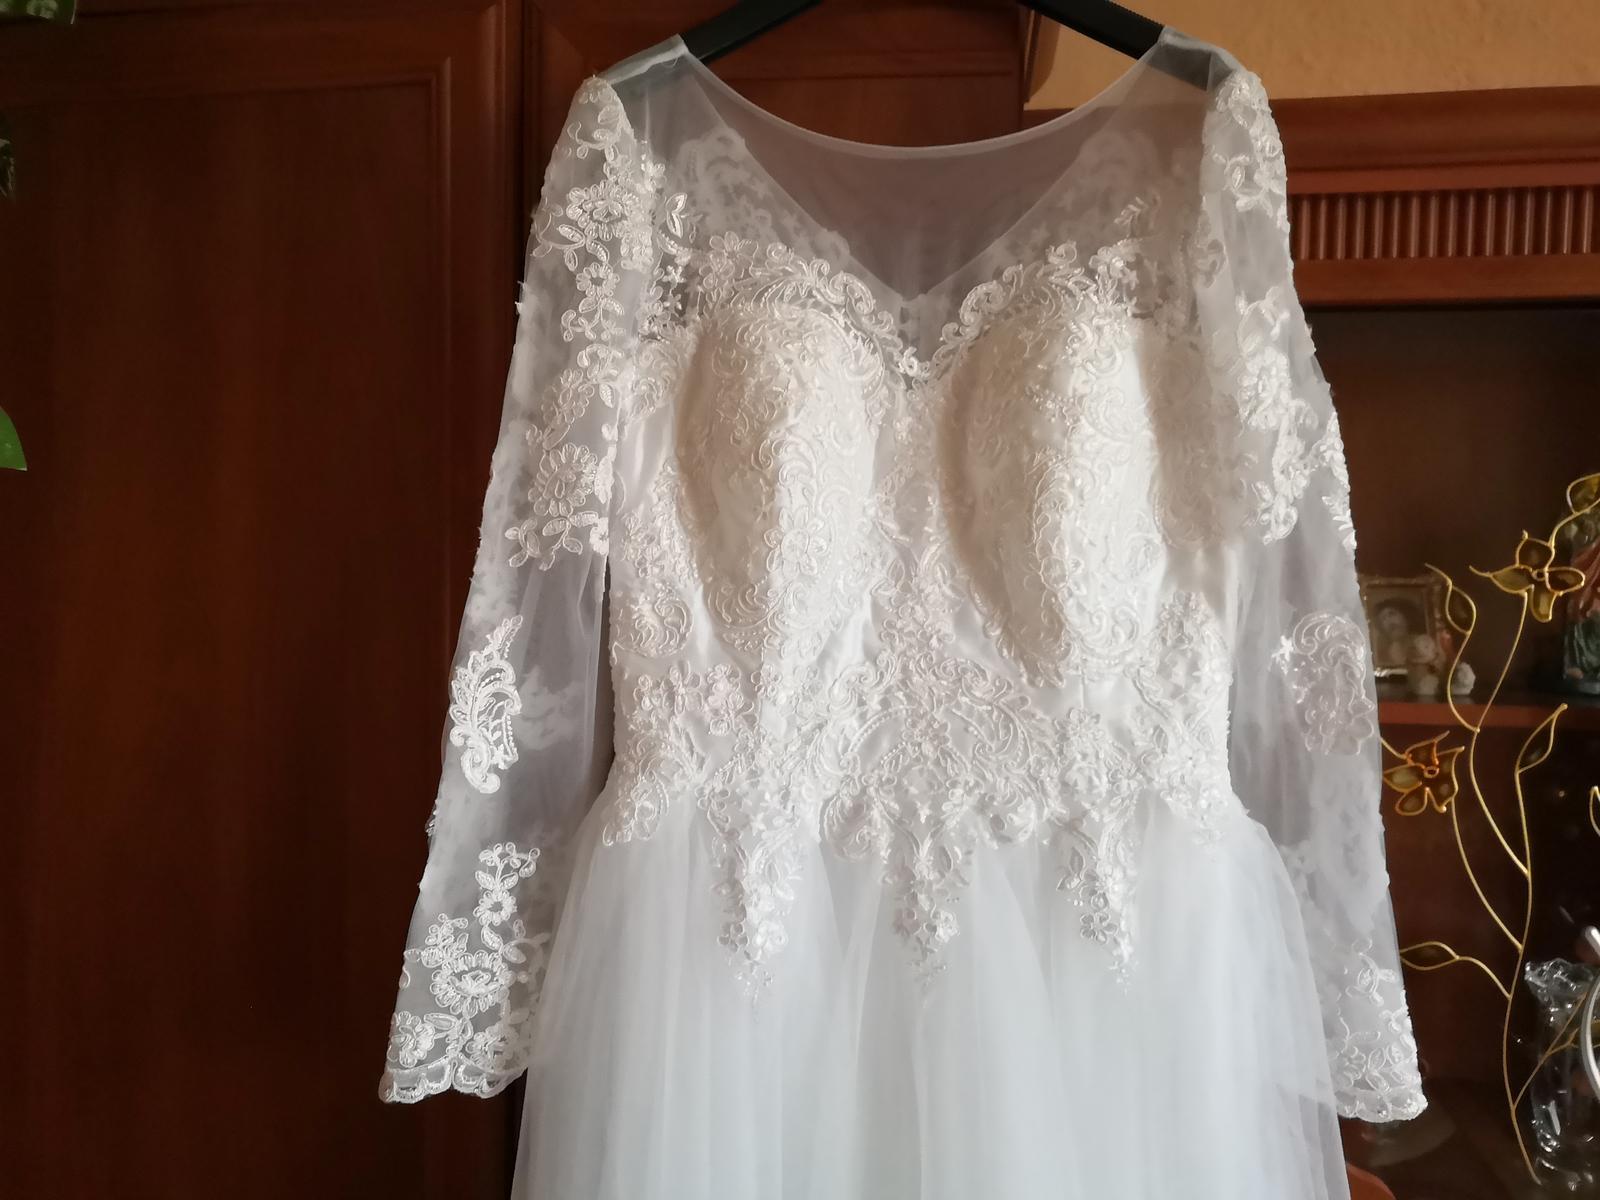 Svadobné šaty NOVÉ M - Obrázok č. 1